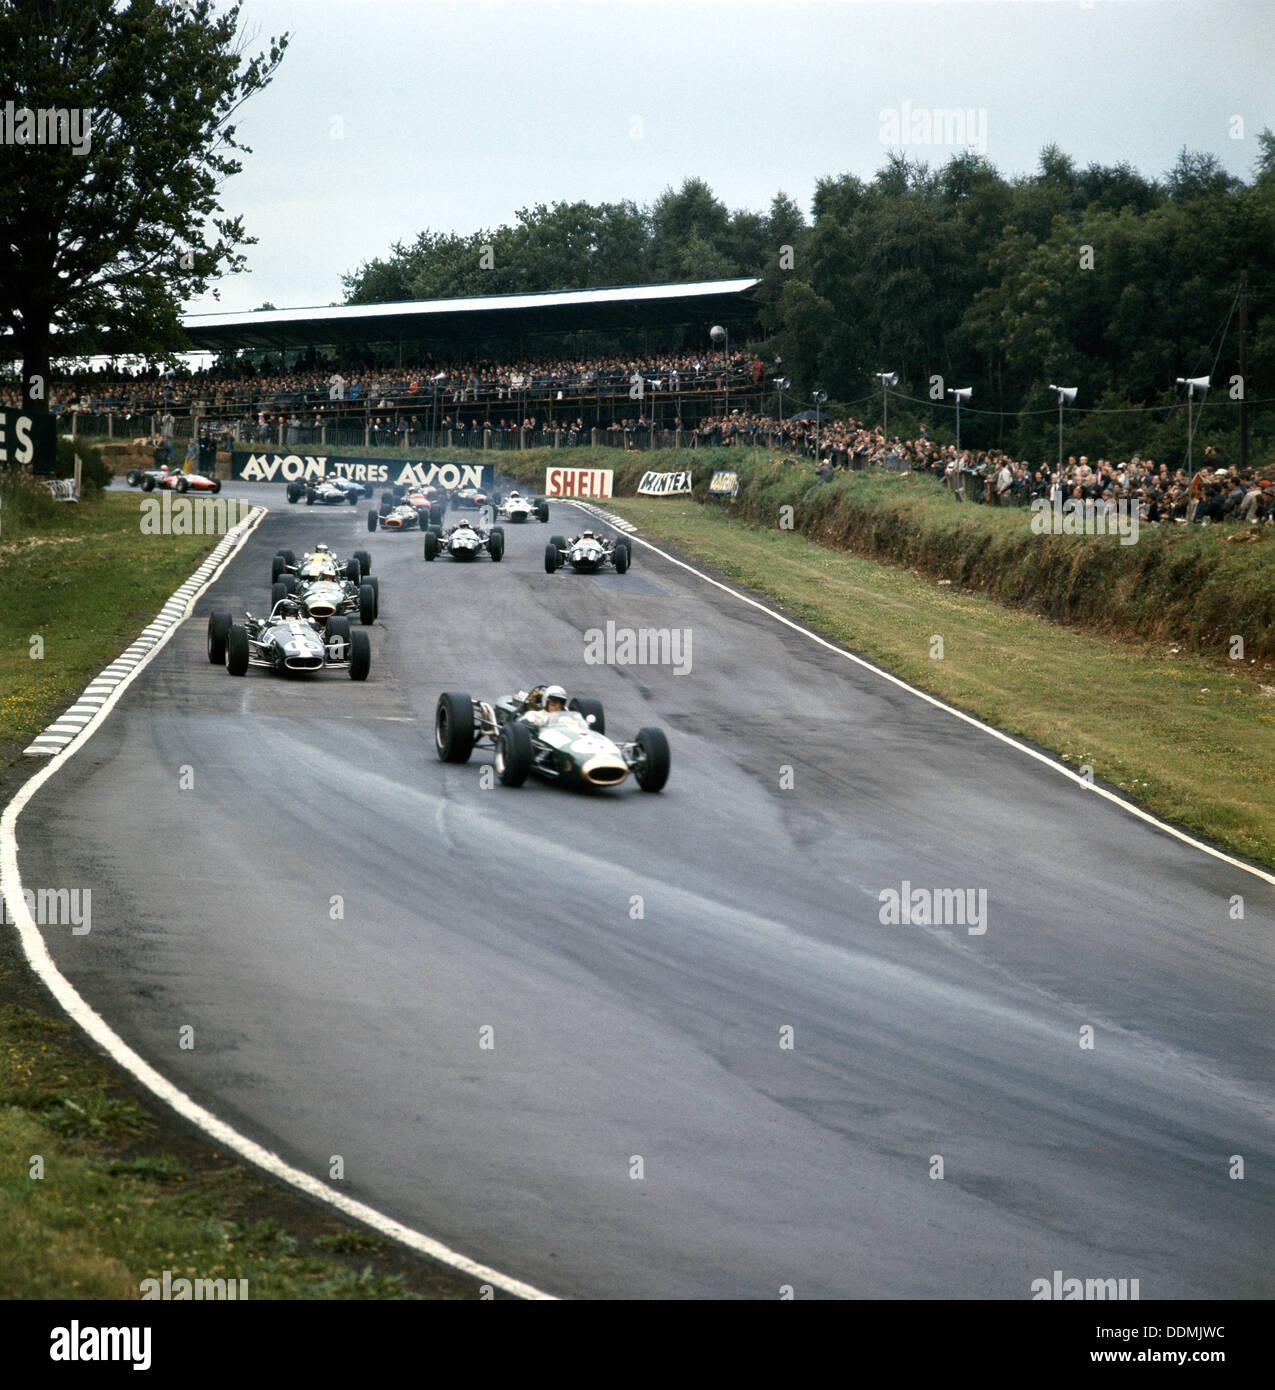 Jack Brabham leading the race, British Grand Prix, Brands Hatch